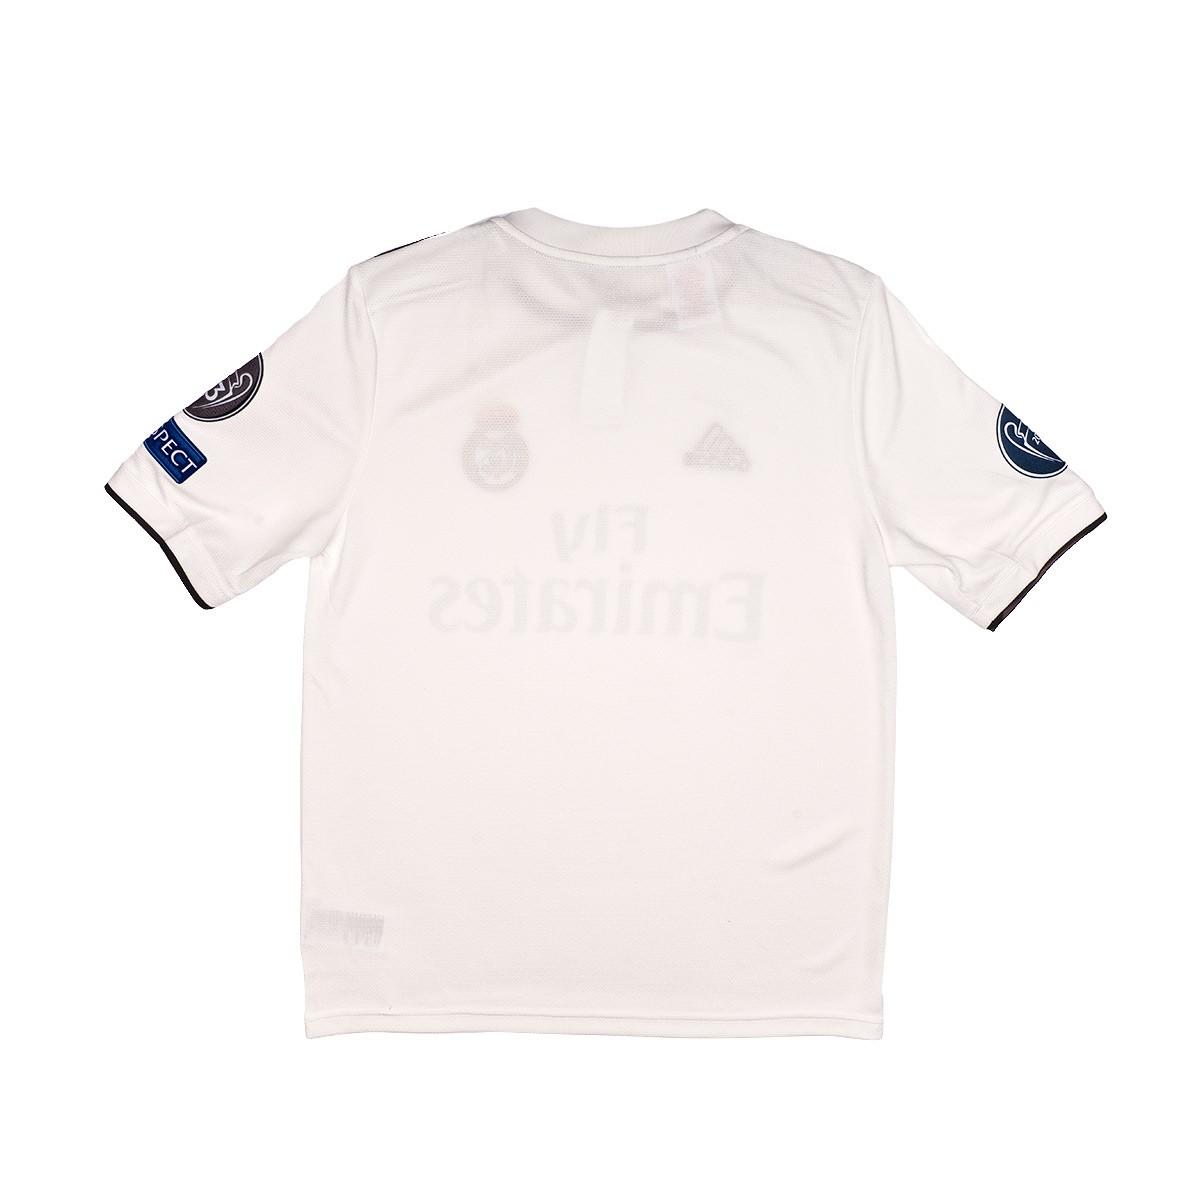 a4a480a1e6635 Camiseta adidas Real Madrid UCL Primera Equipación 2018-2019 Niño Core white -Black - Tienda de fútbol Fútbol Emotion